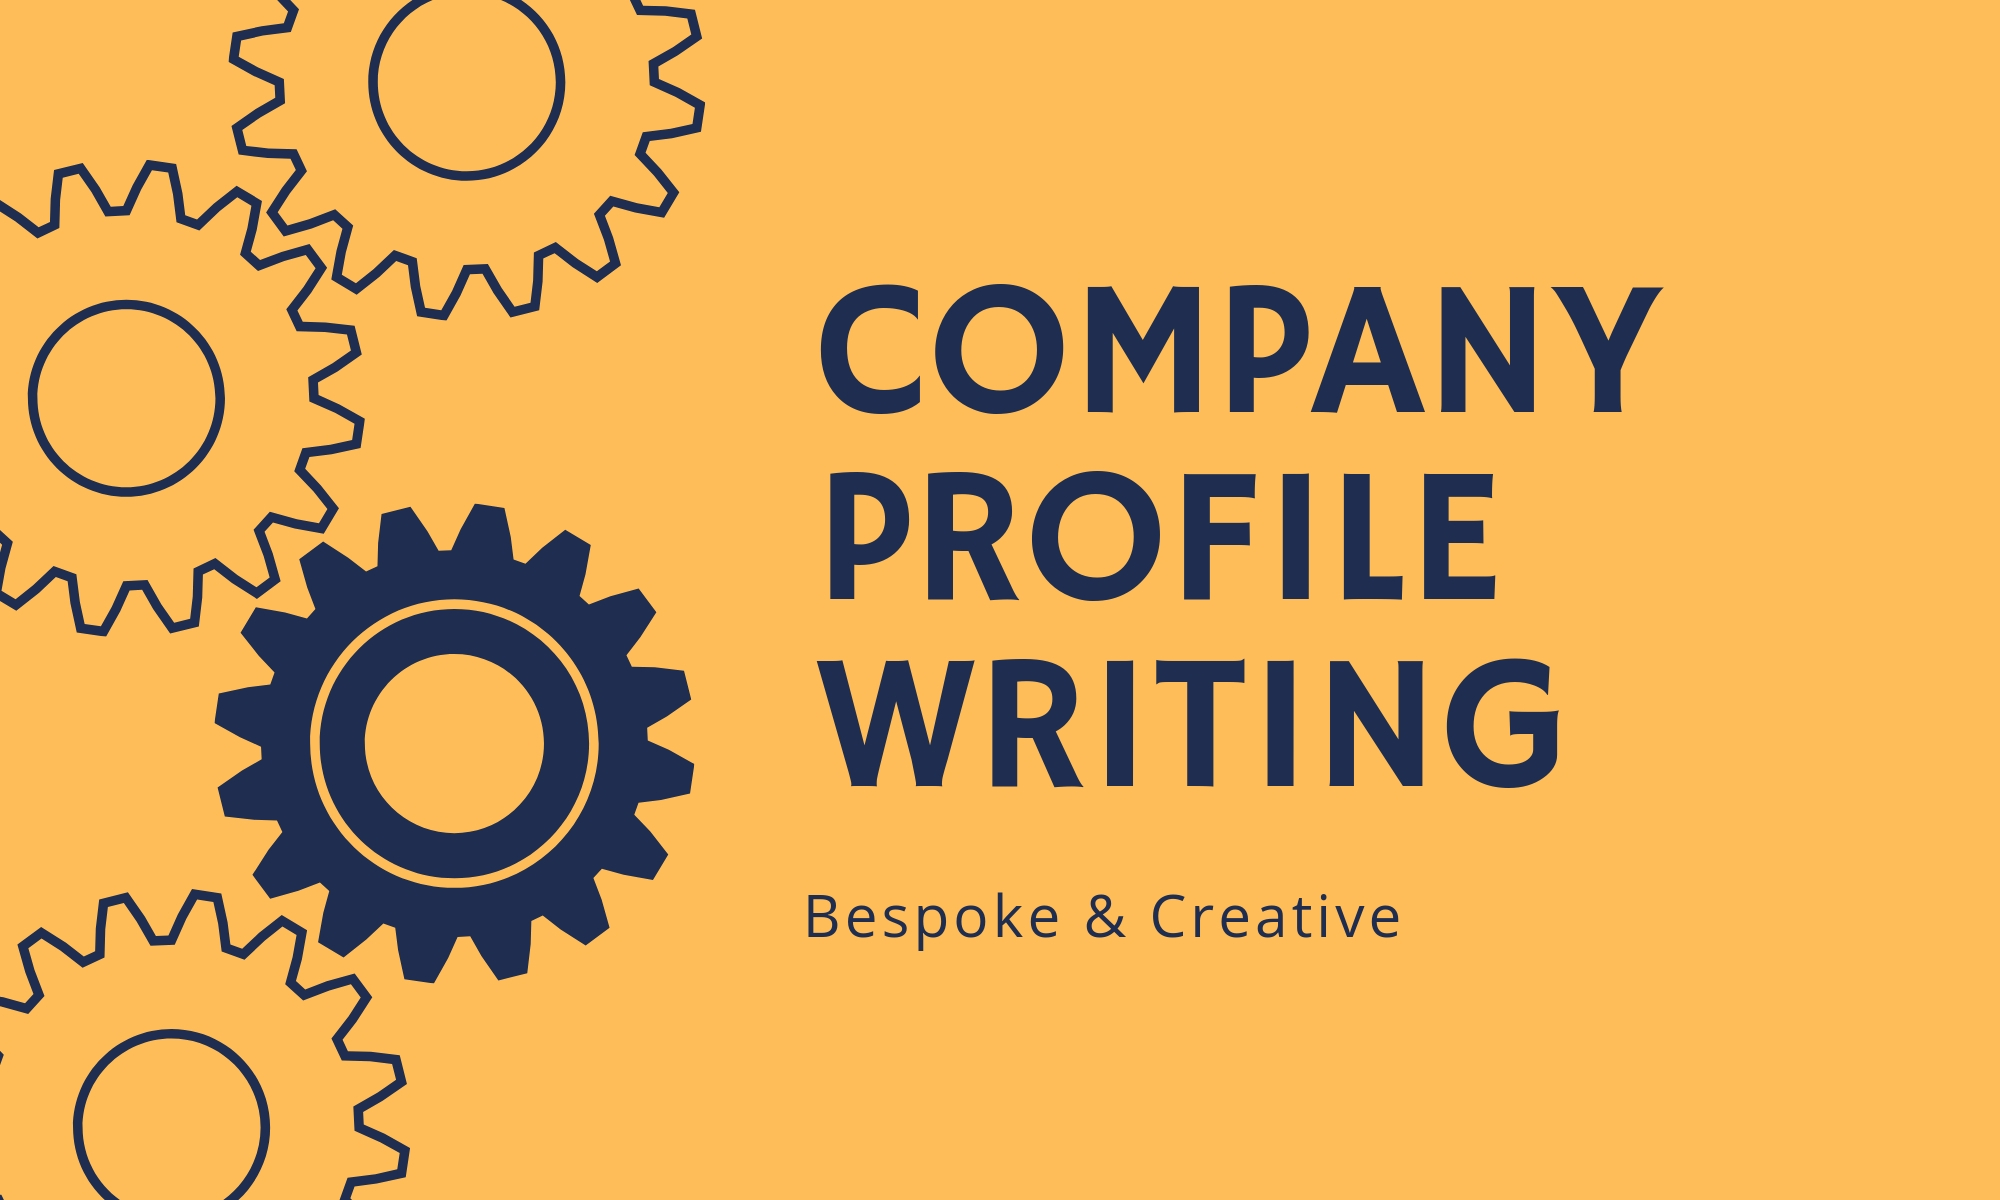 How to Write Company Profile